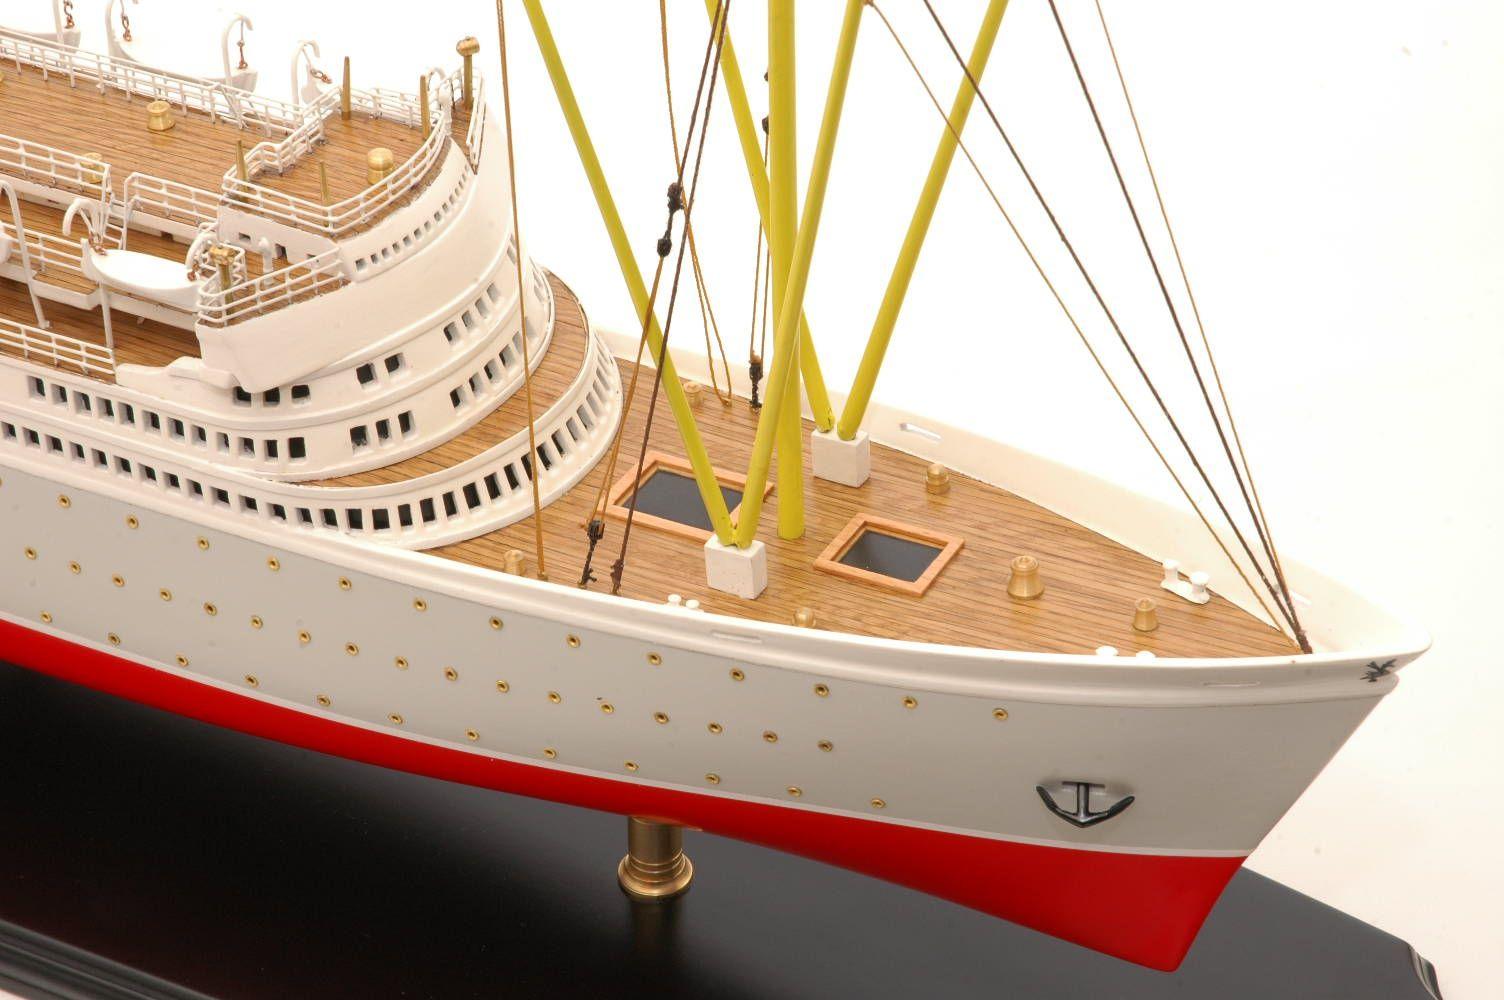 549-6433-Bergensfjord-model-ship